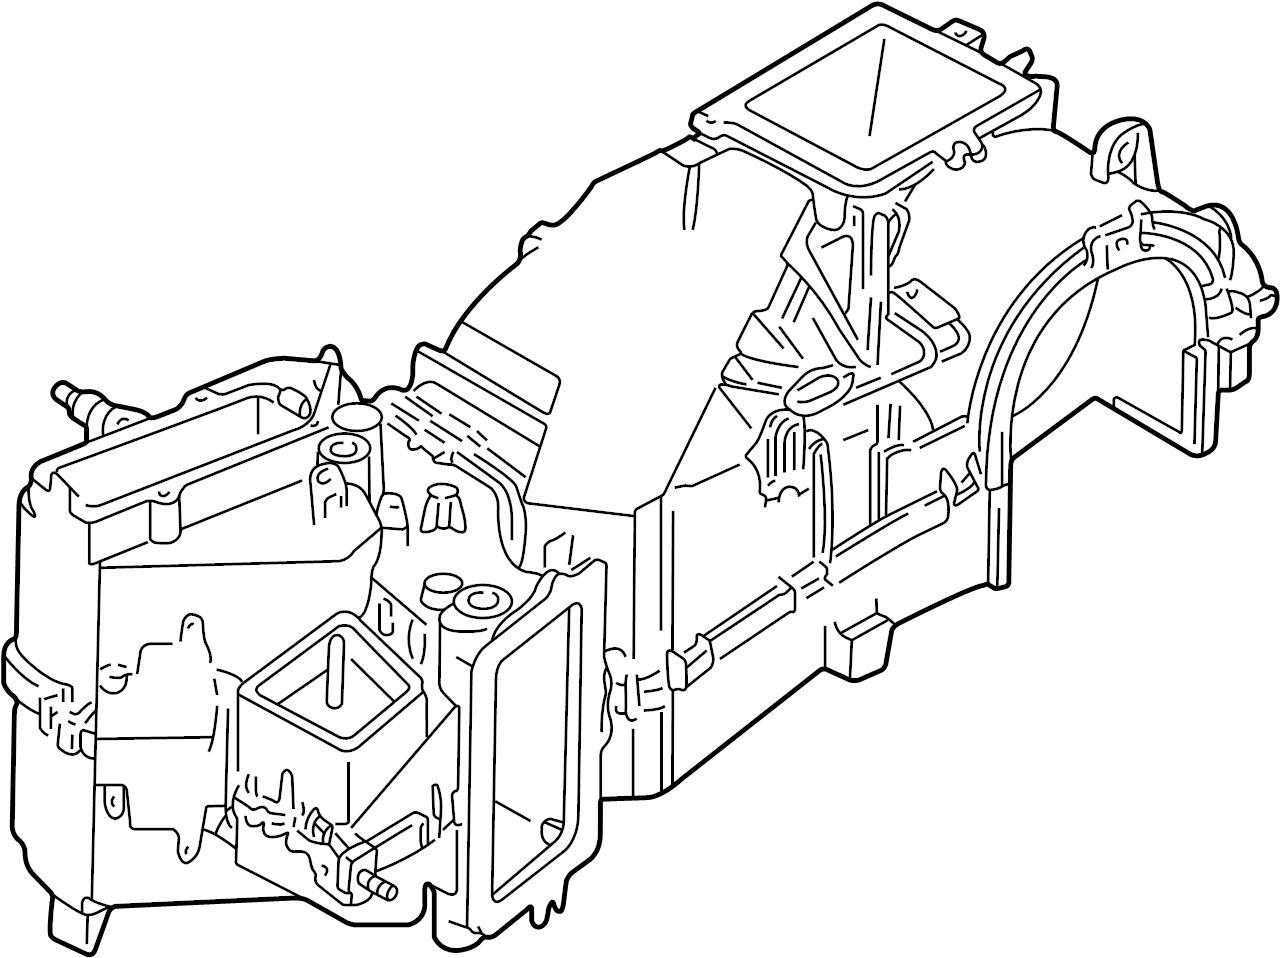 1999 Volkswagen Cabrio Evaporator. Evaporator core